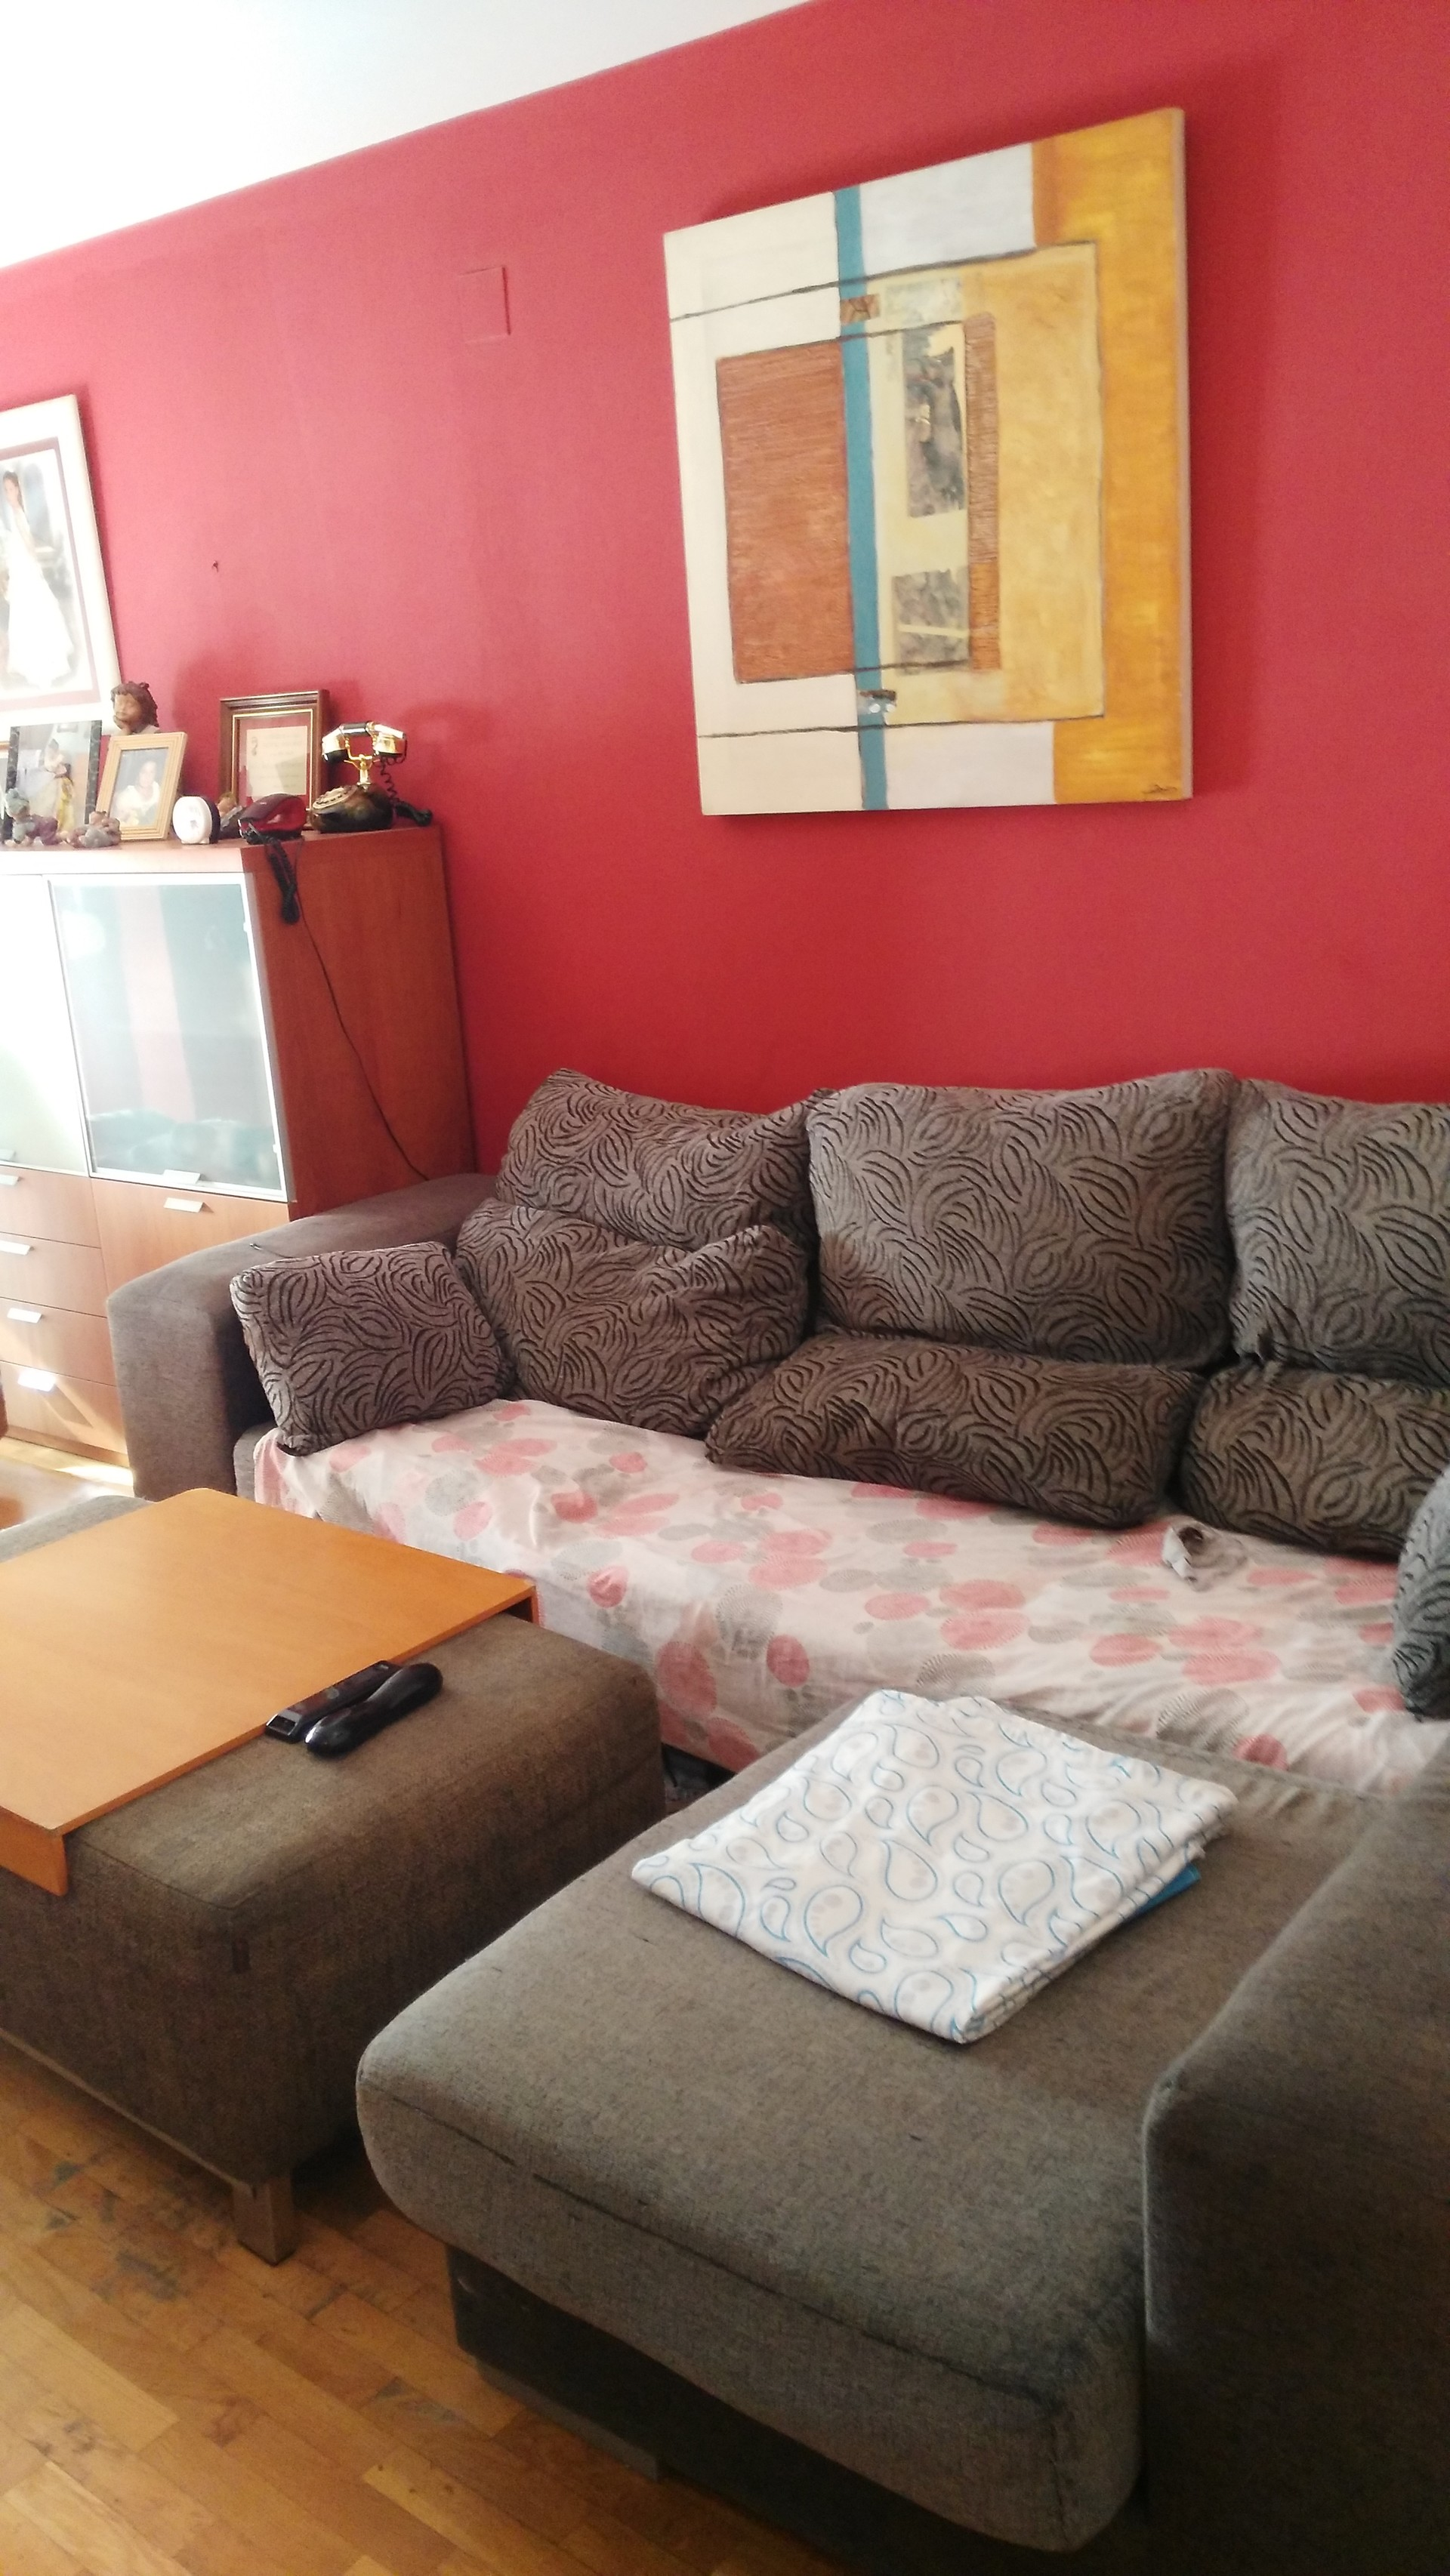 Alquiler habitaci n para estudiantes zona playa malvarrosa for Pisos alquiler malvarrosa